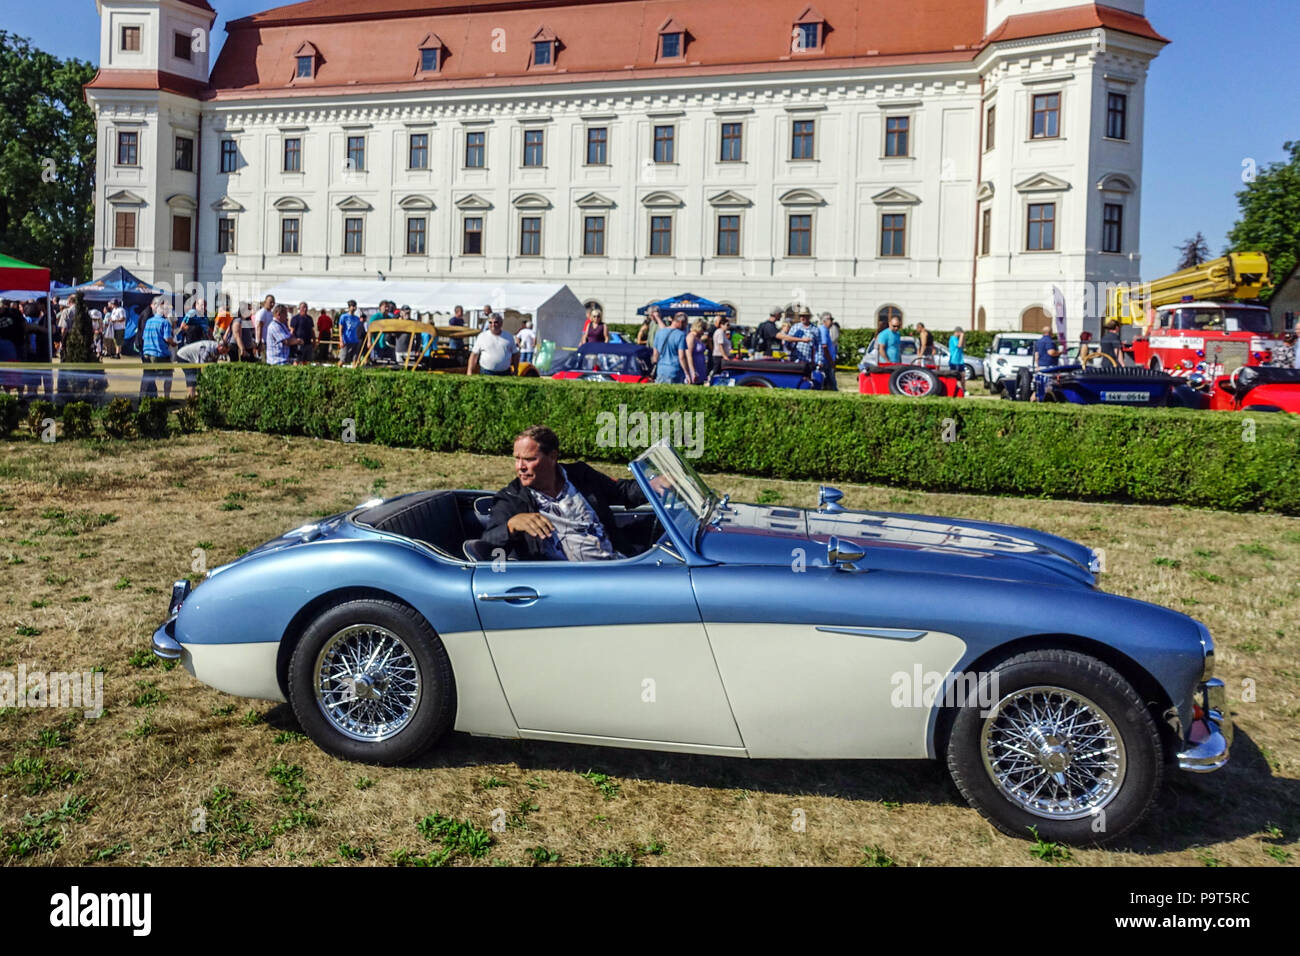 Austin Healey 3000 Mk III Sport Auto, Holesov Schlossgarten, Tschechische Republik Stockbild